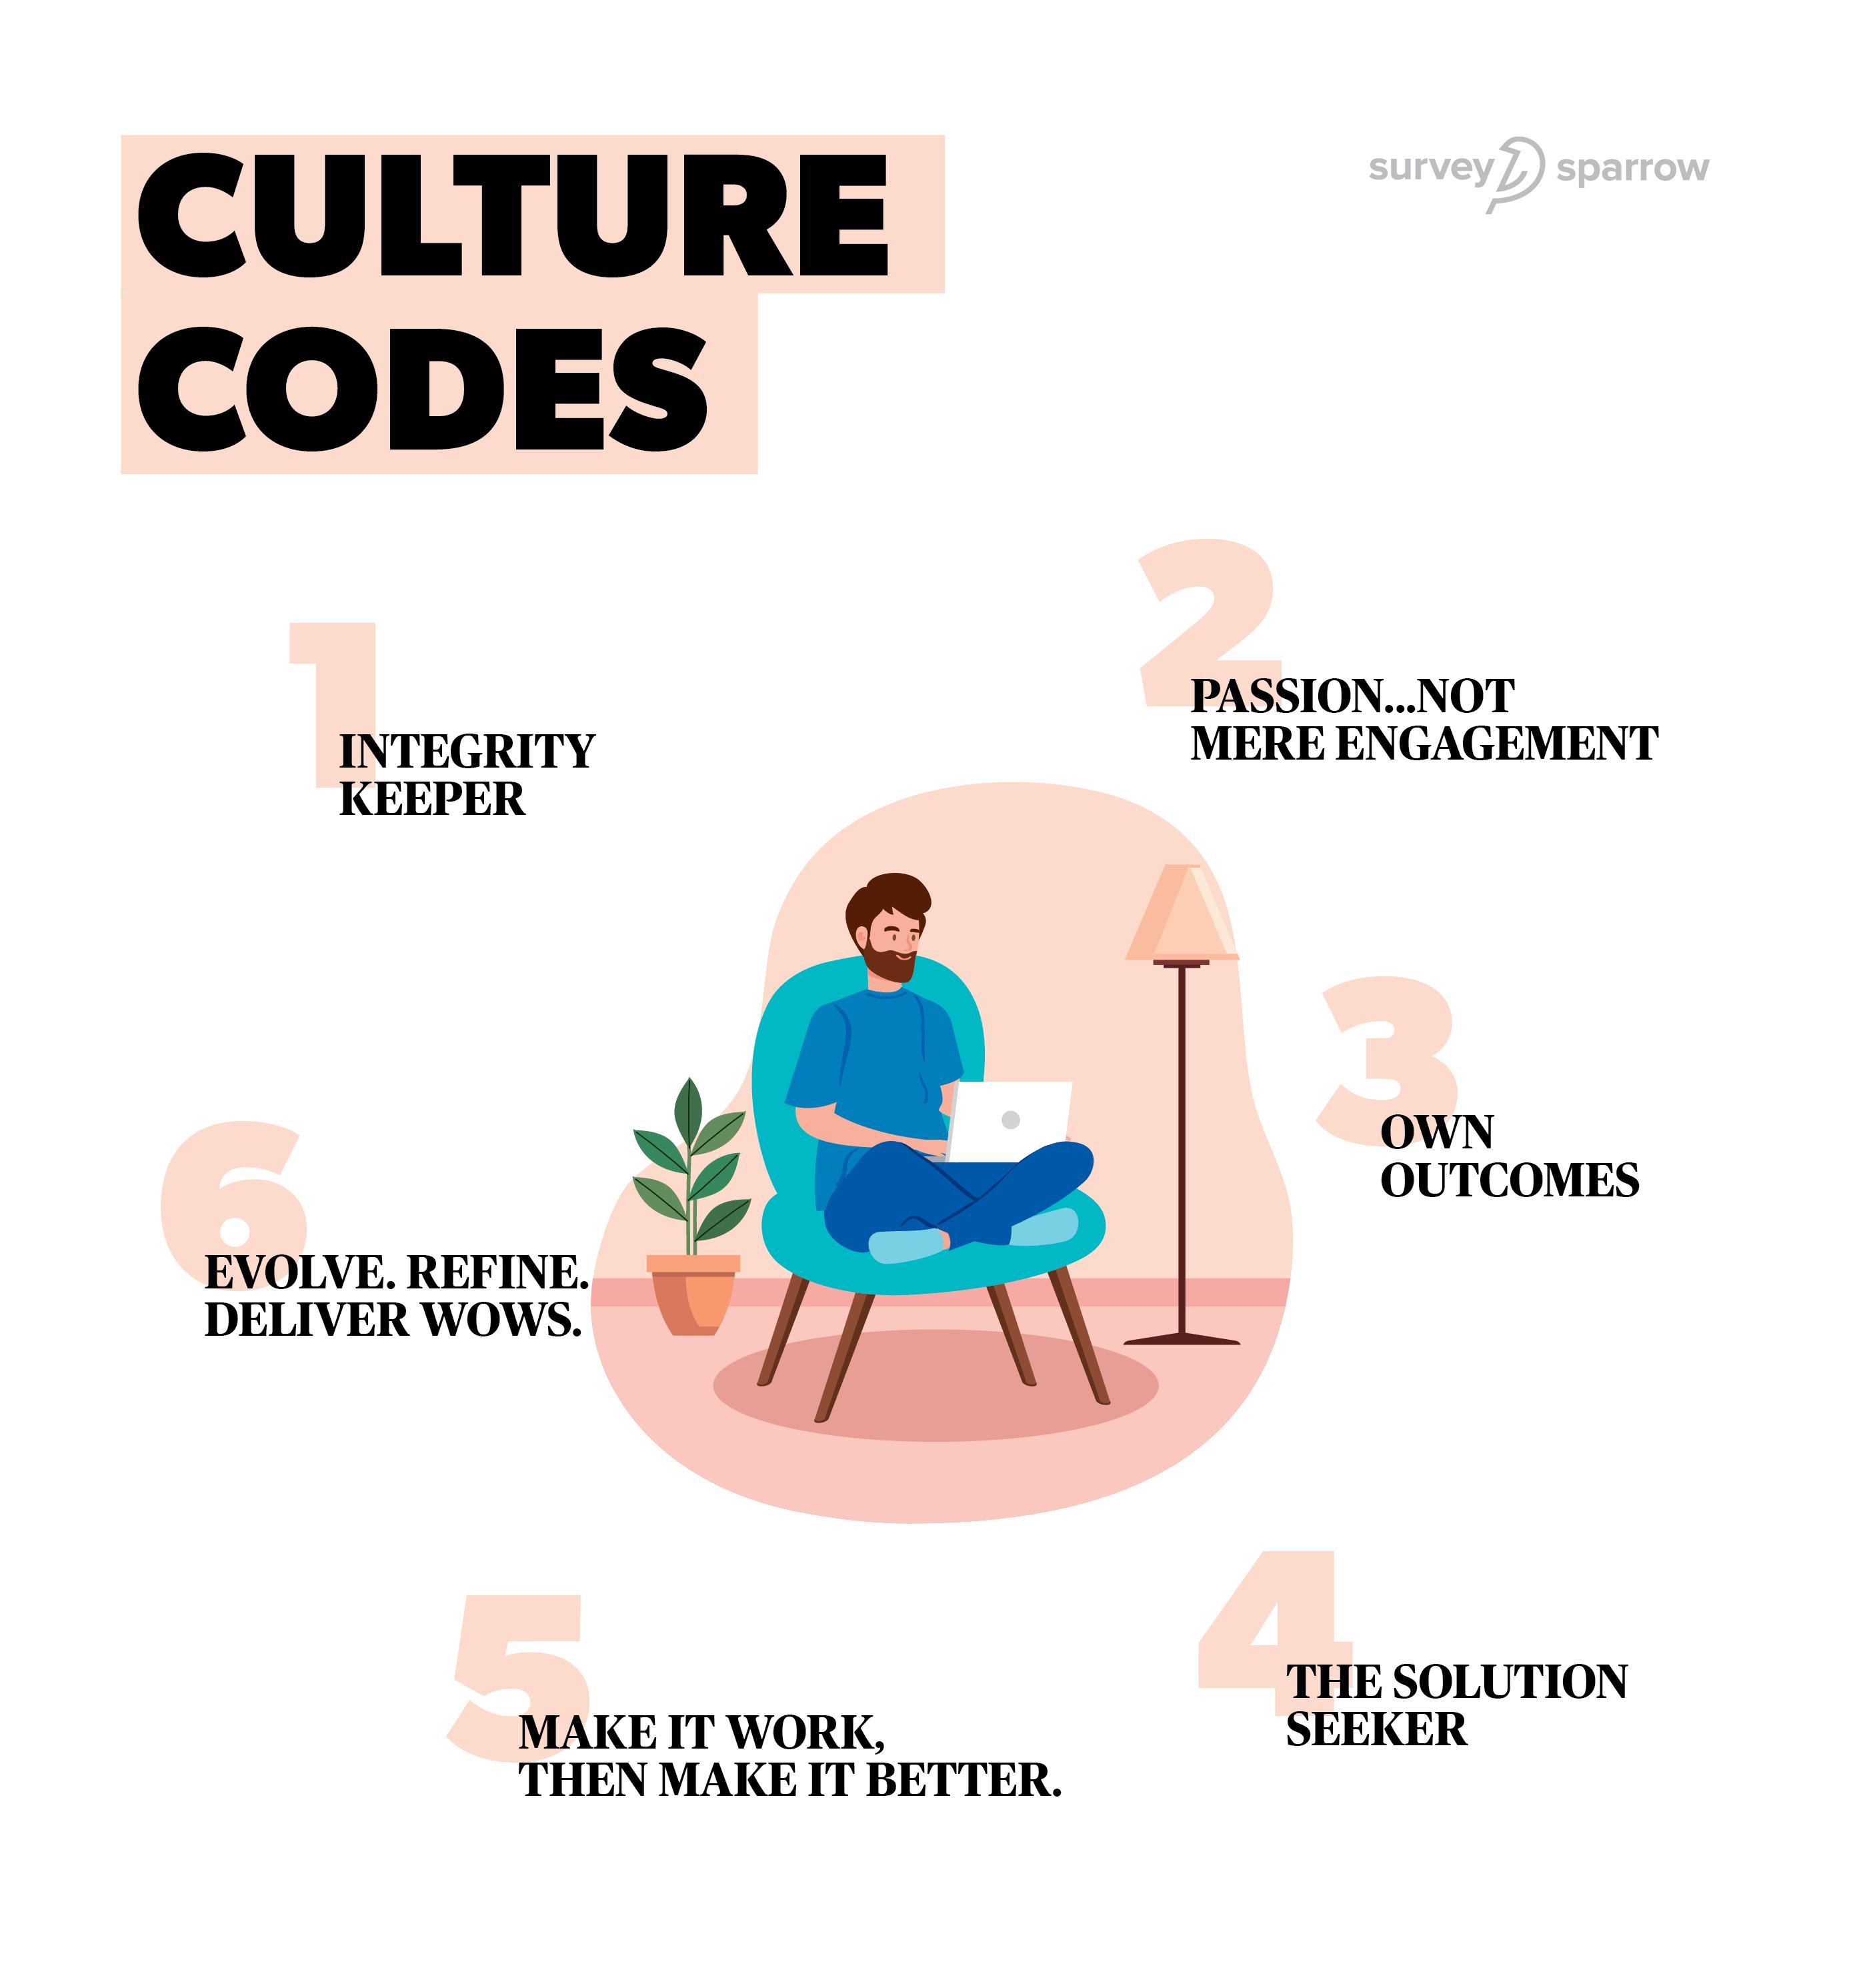 6 culture codes of SurveySparrow.